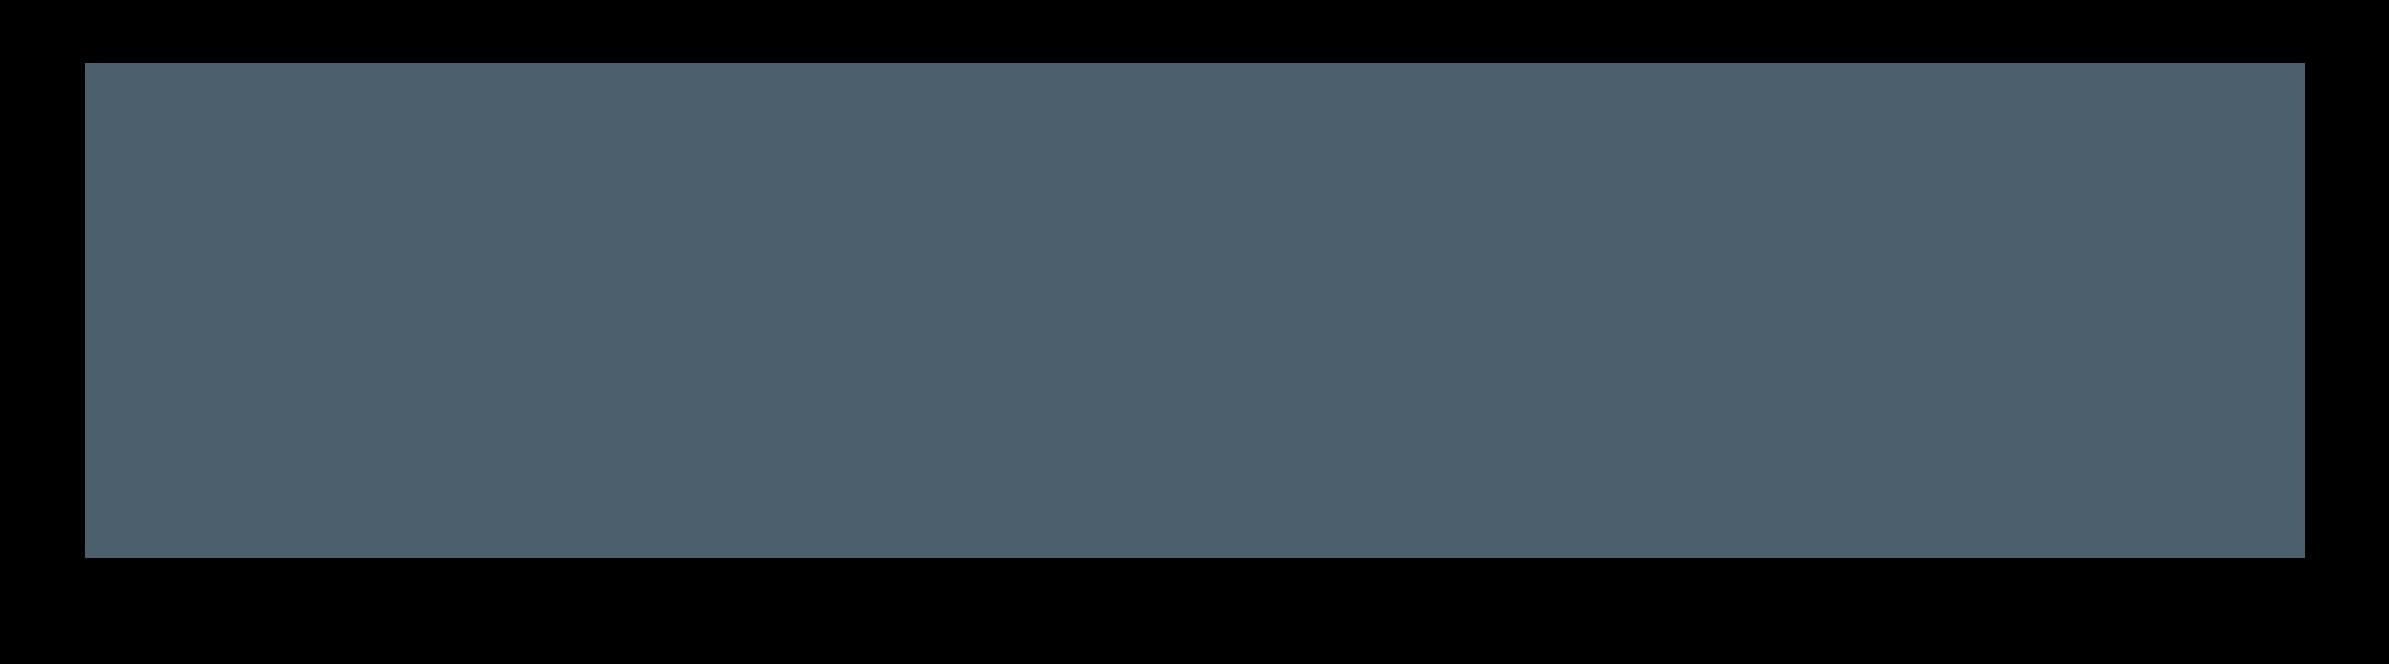 Gingerlily Logo